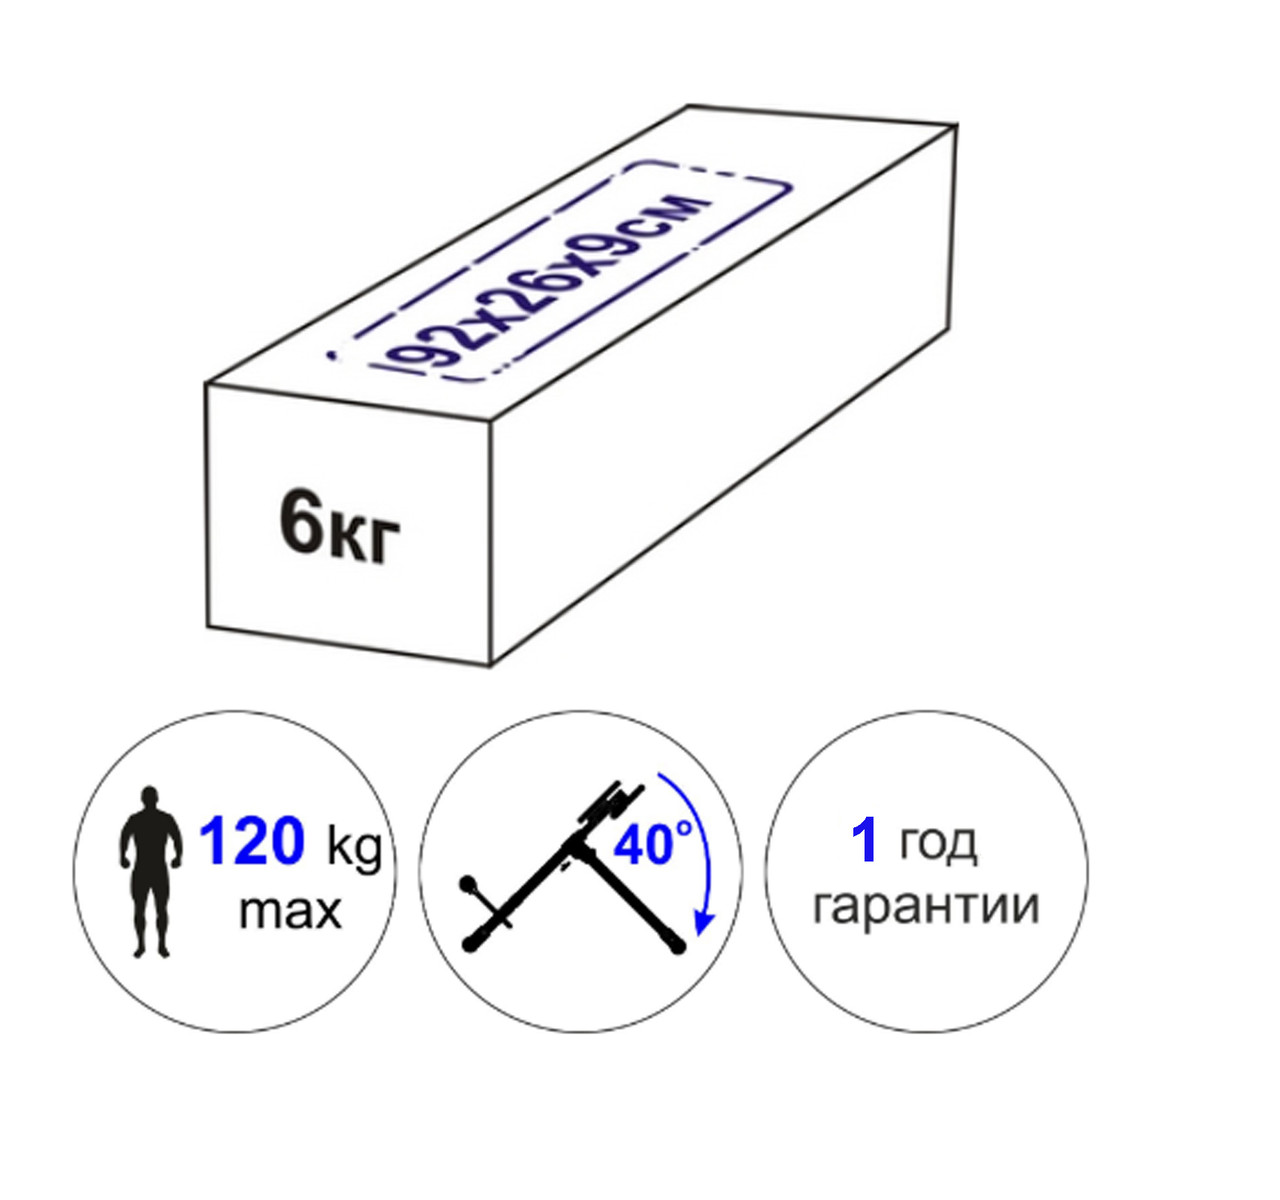 Скамья для мышц спины 120 кг Россия - фото 3